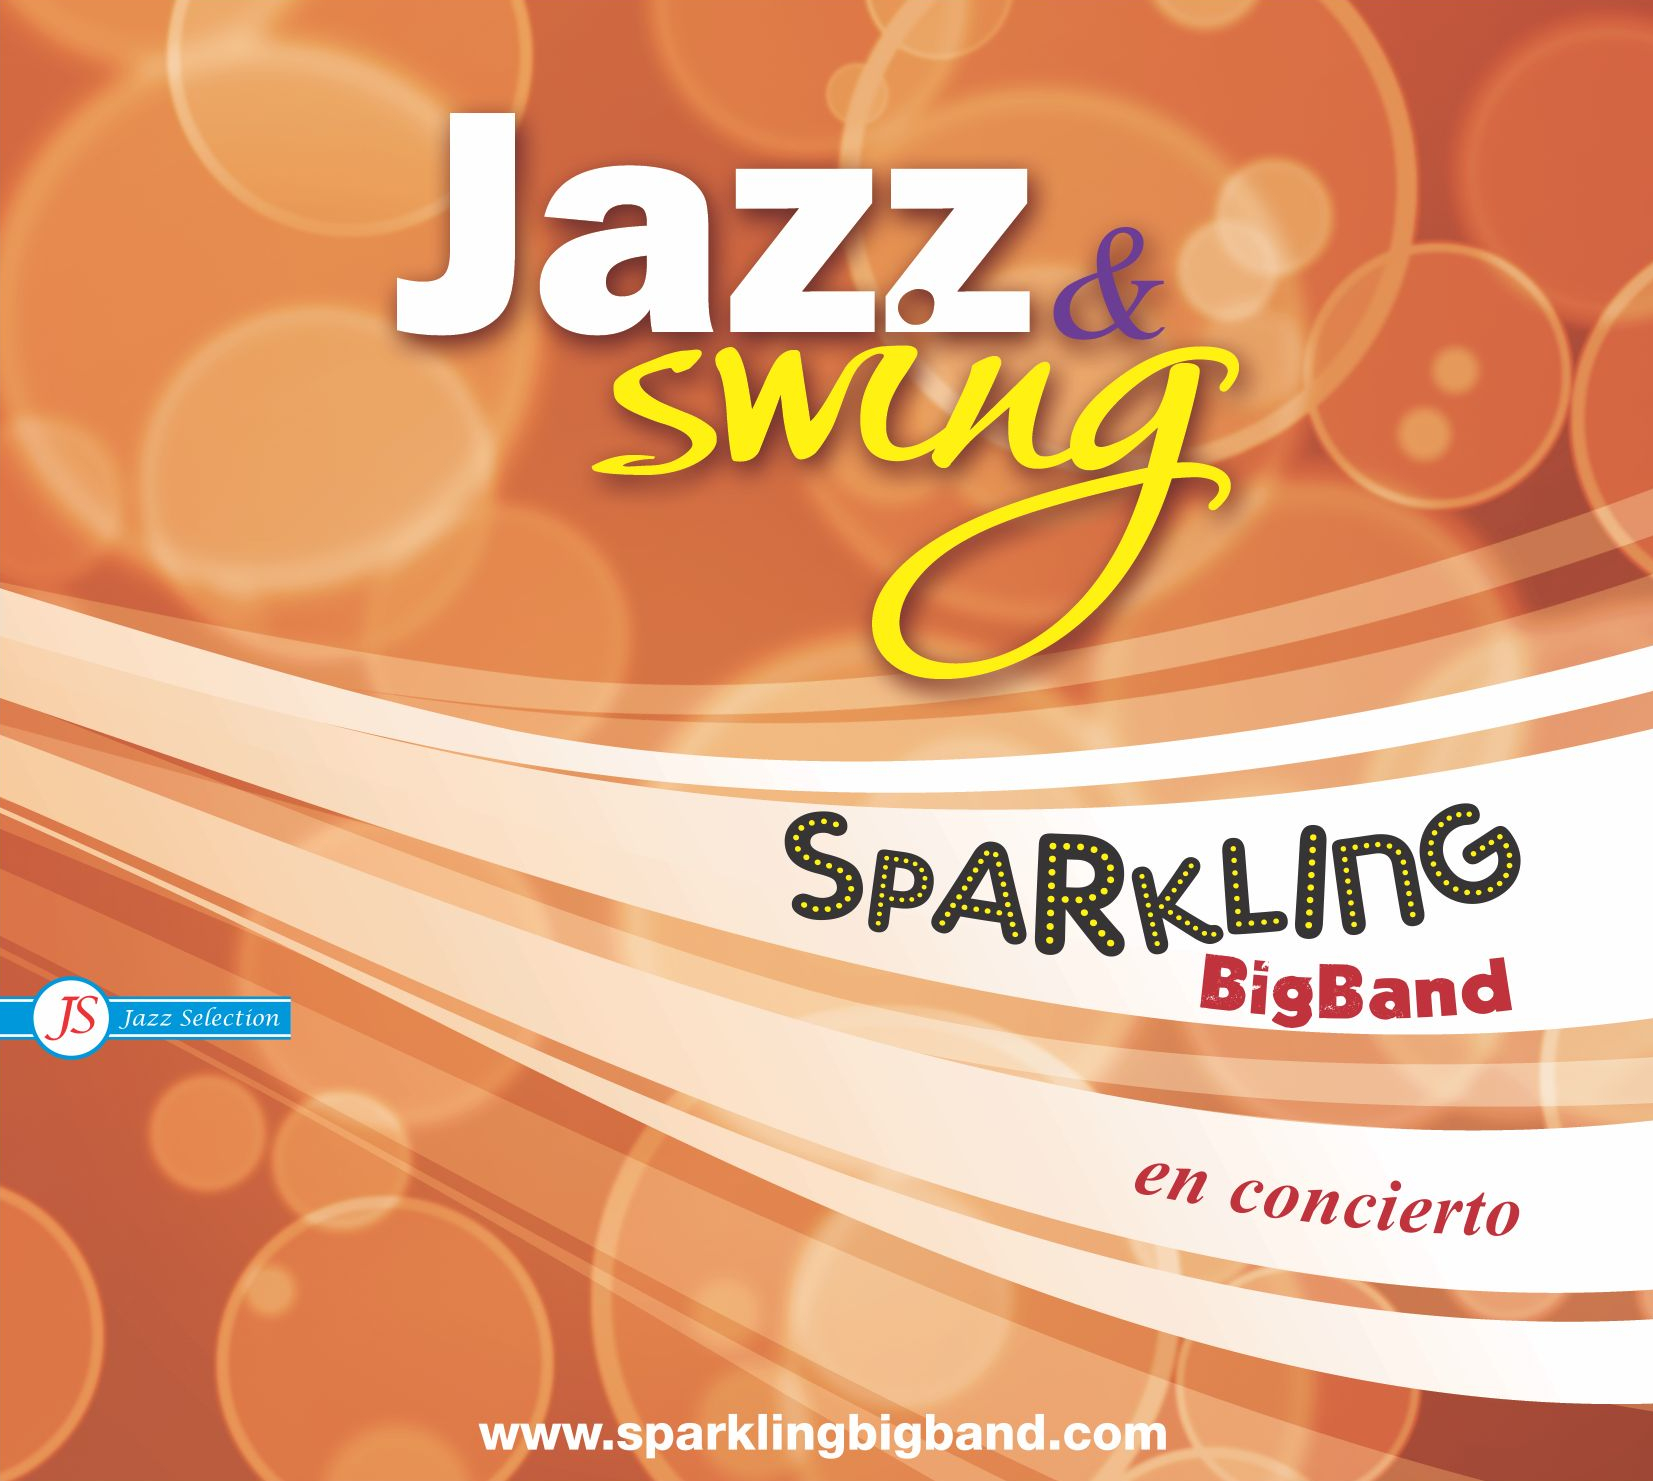 Jazz&Swing - Sparkling Big Band